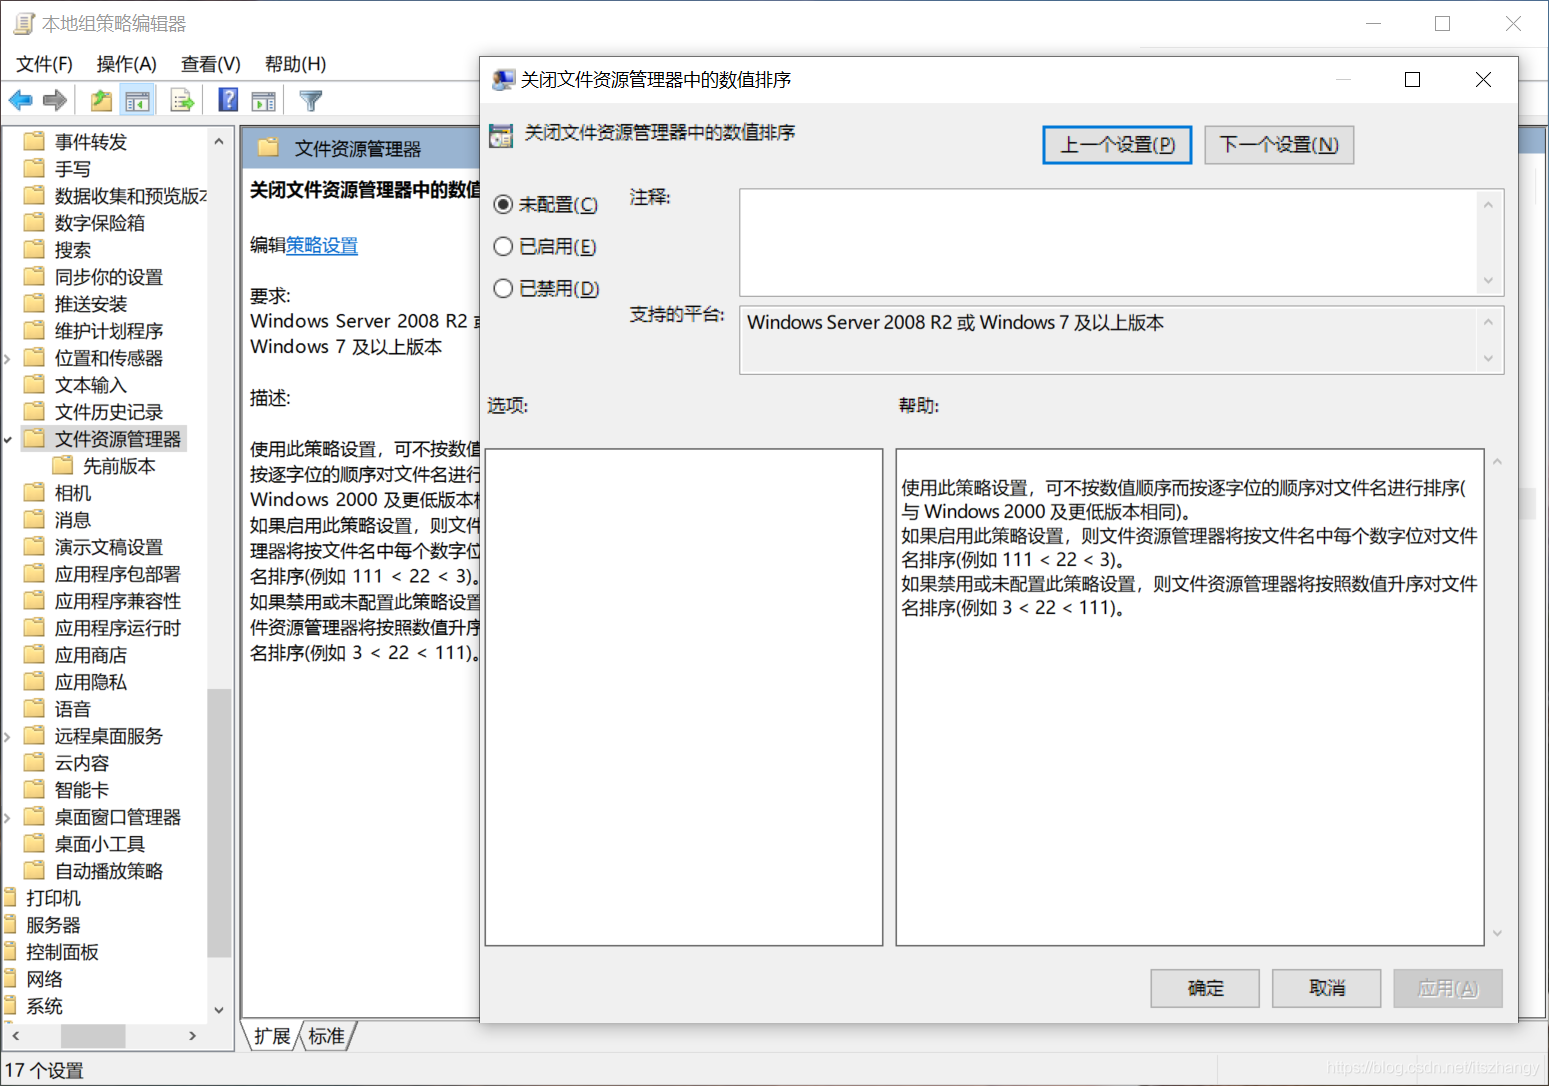 Windows 10组策略编辑器中对数值排序的描述和开关